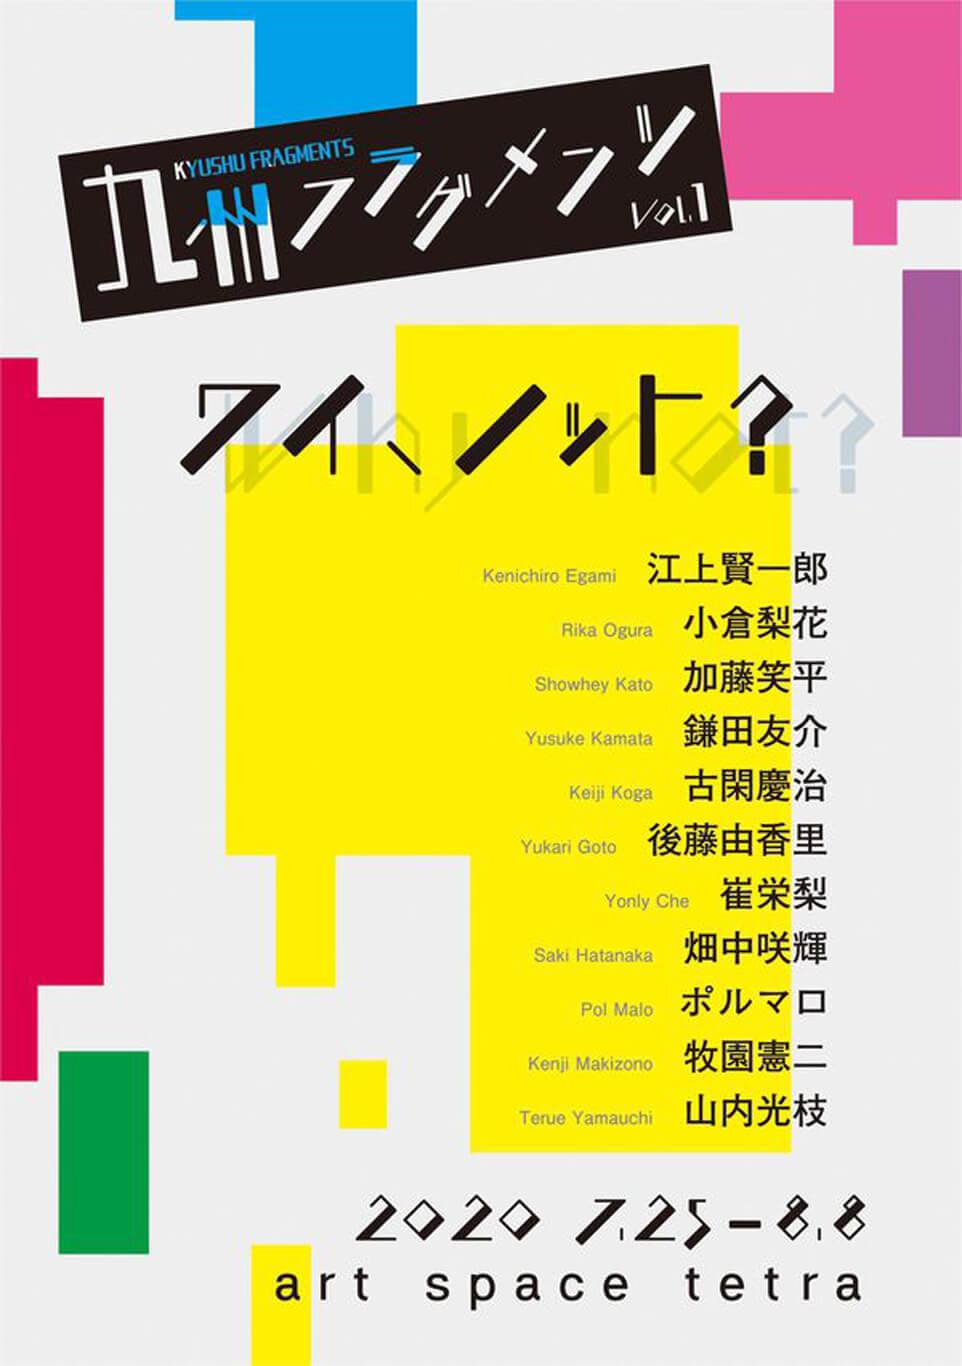 tetra-202007-九州フラグメンツvol.01